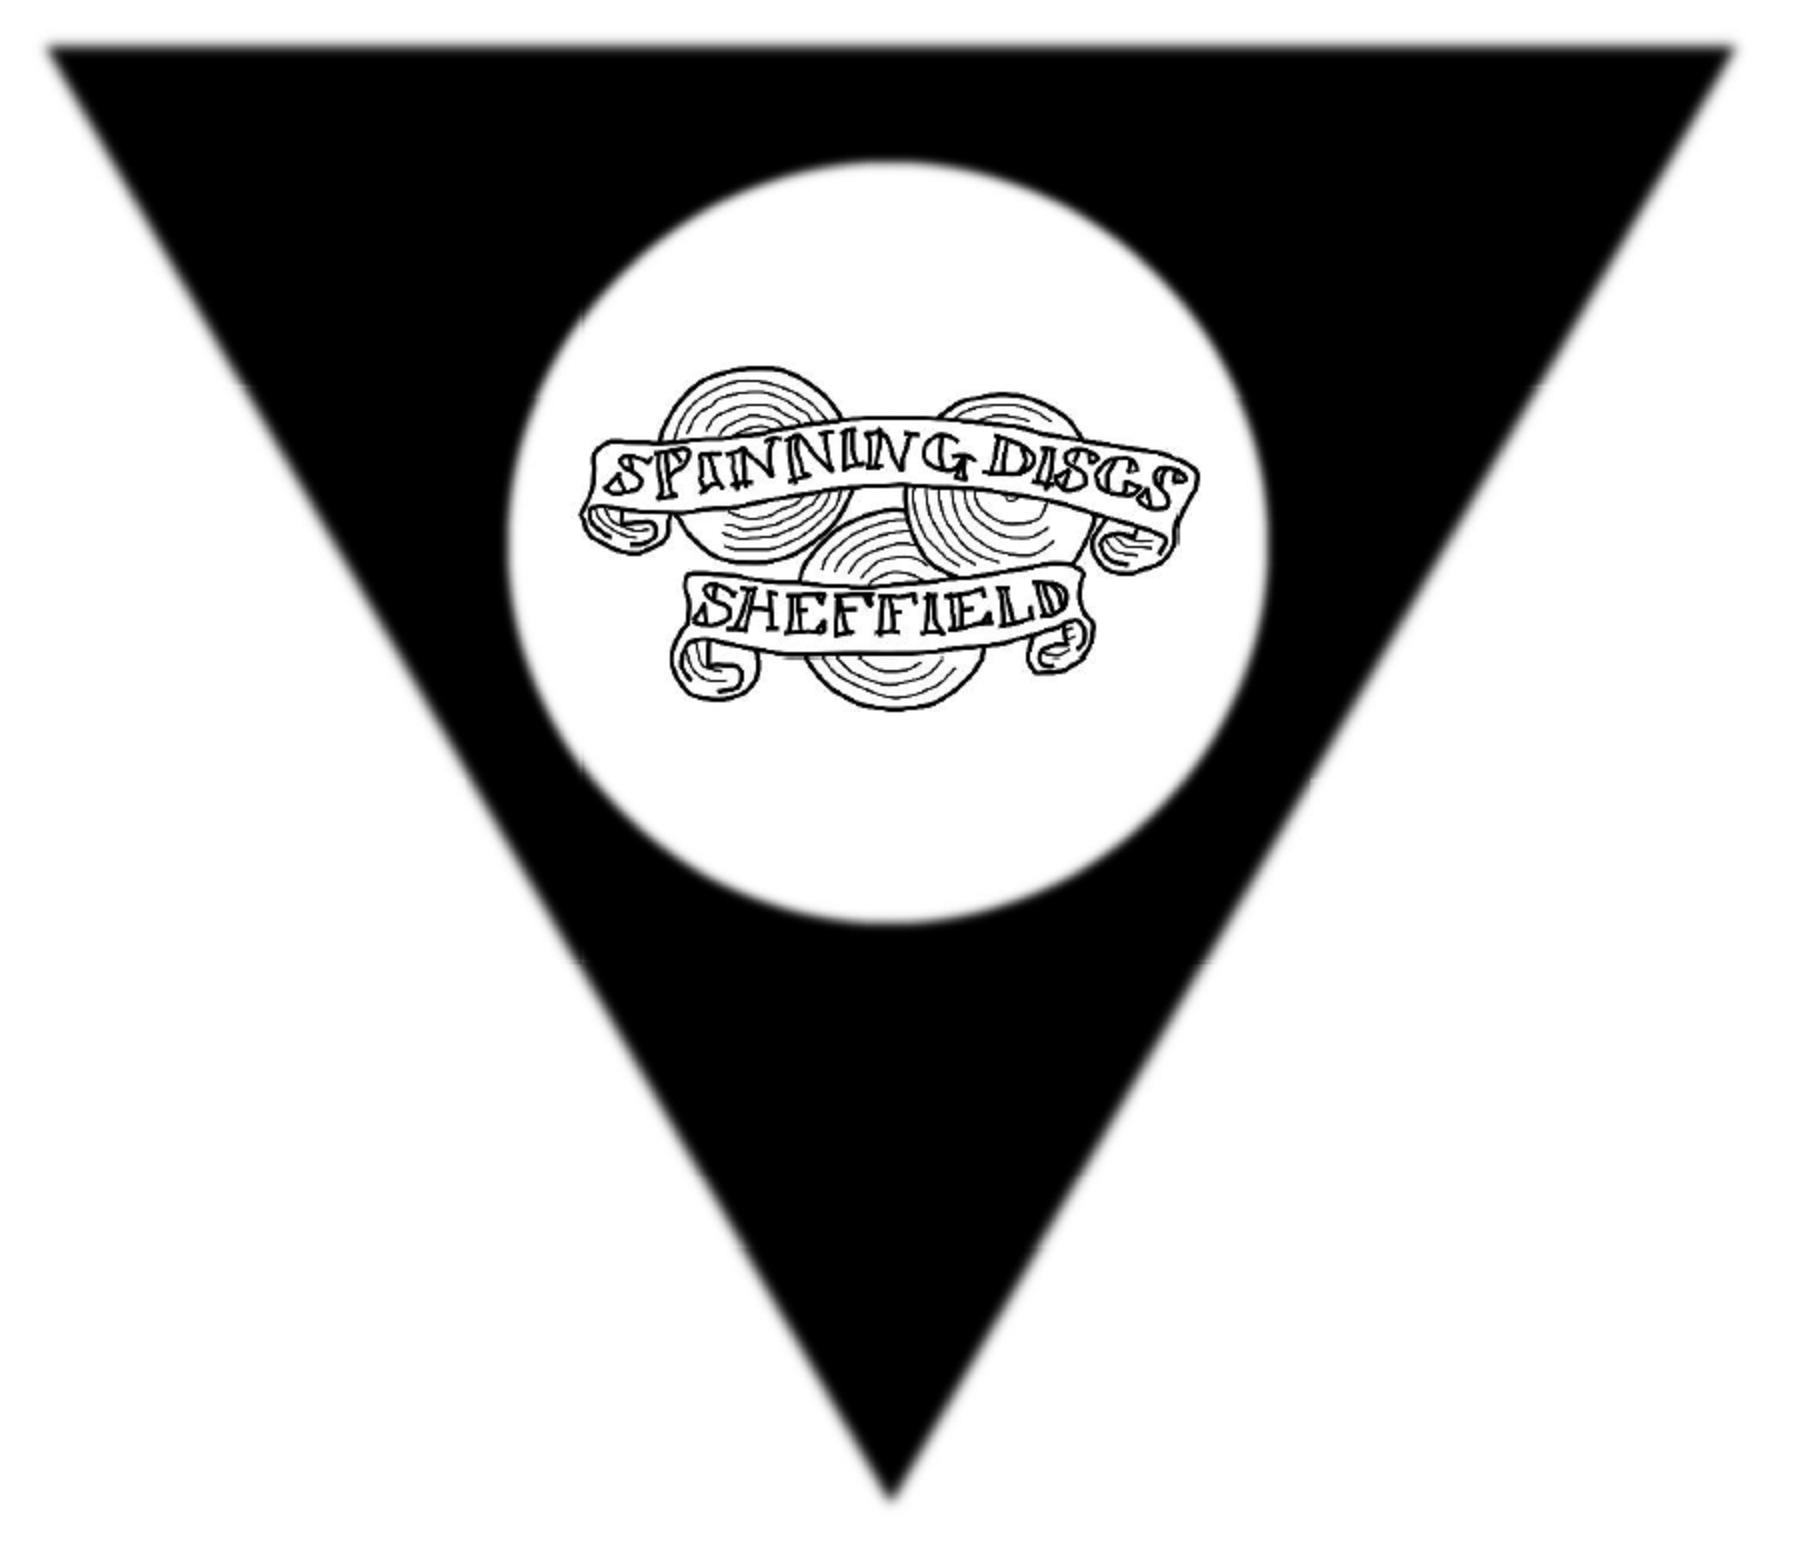 The Vinyl Triangle - Sheffield